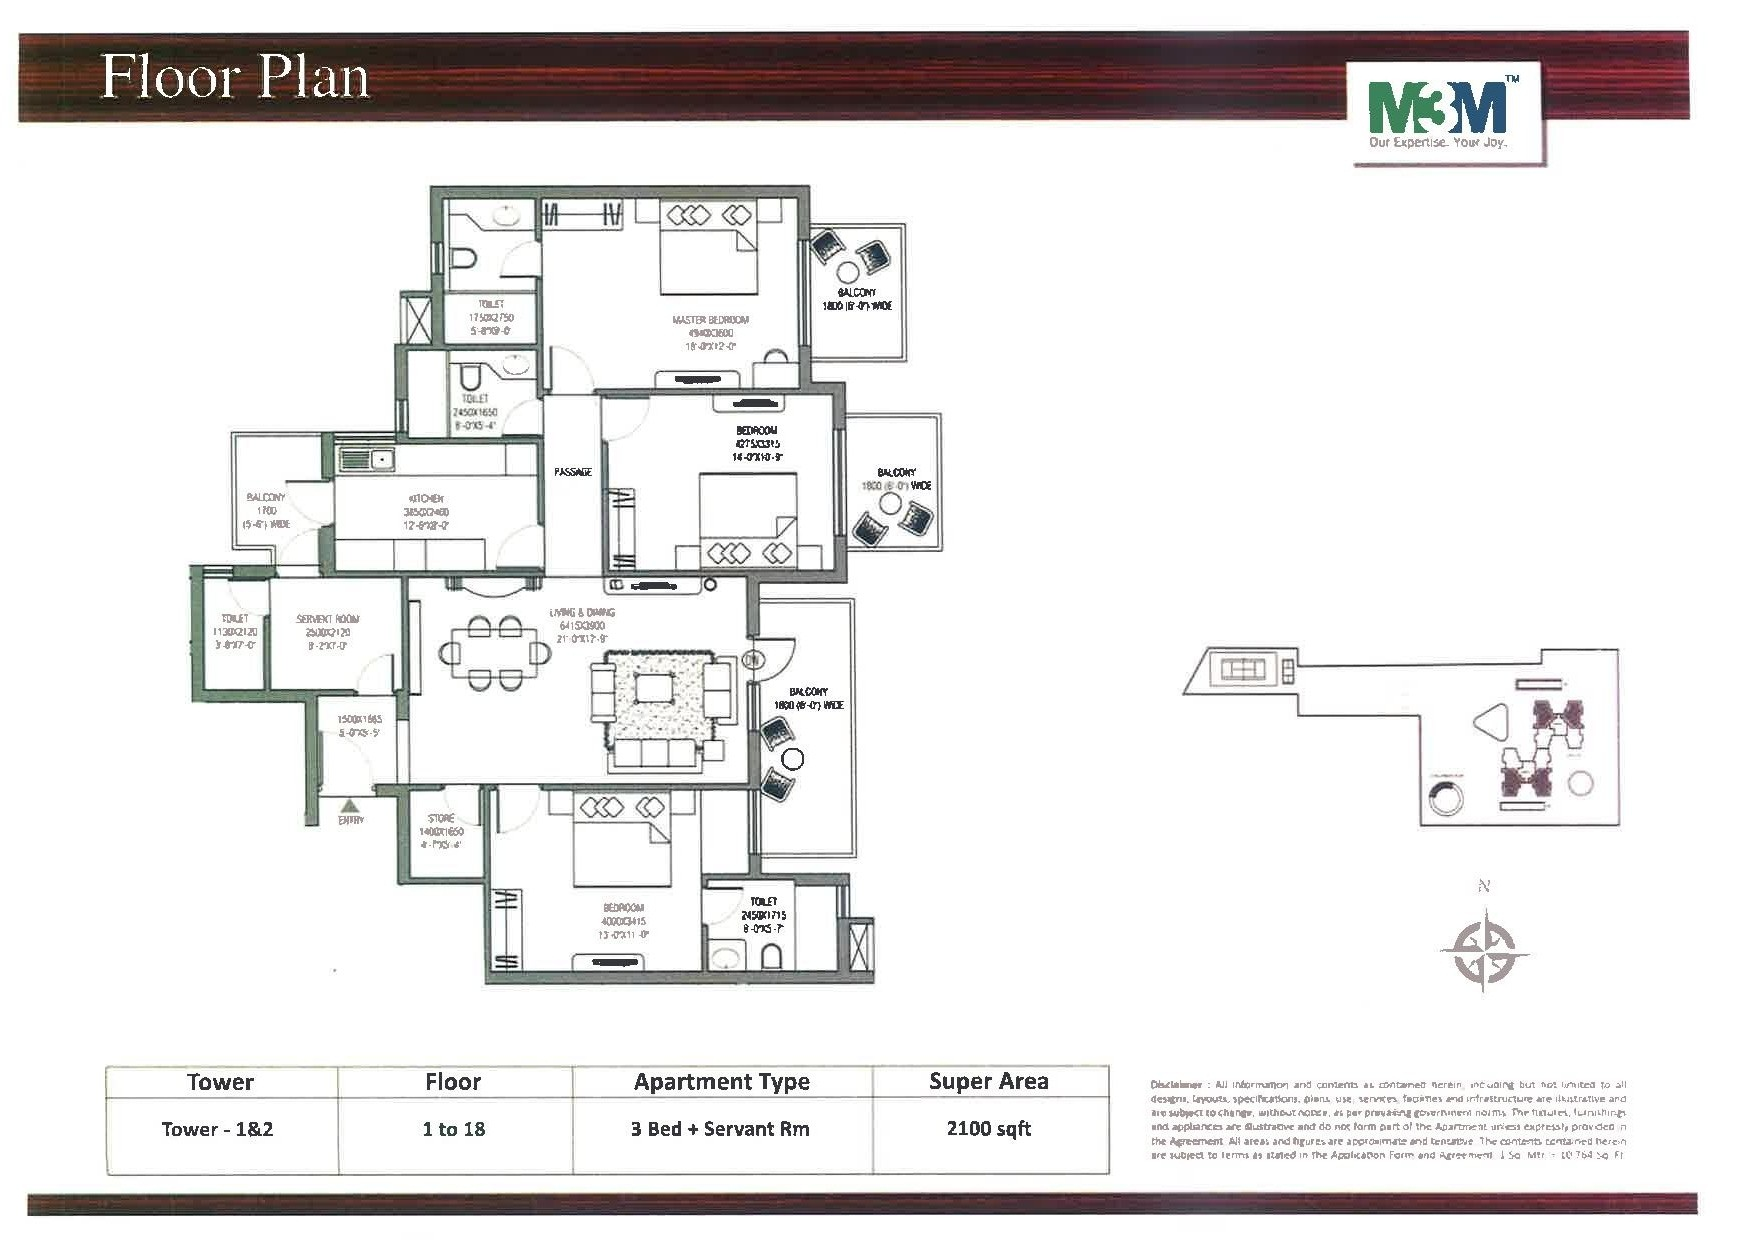 M3m escala sector 70a gurgaon for Landcraft homes floor plans